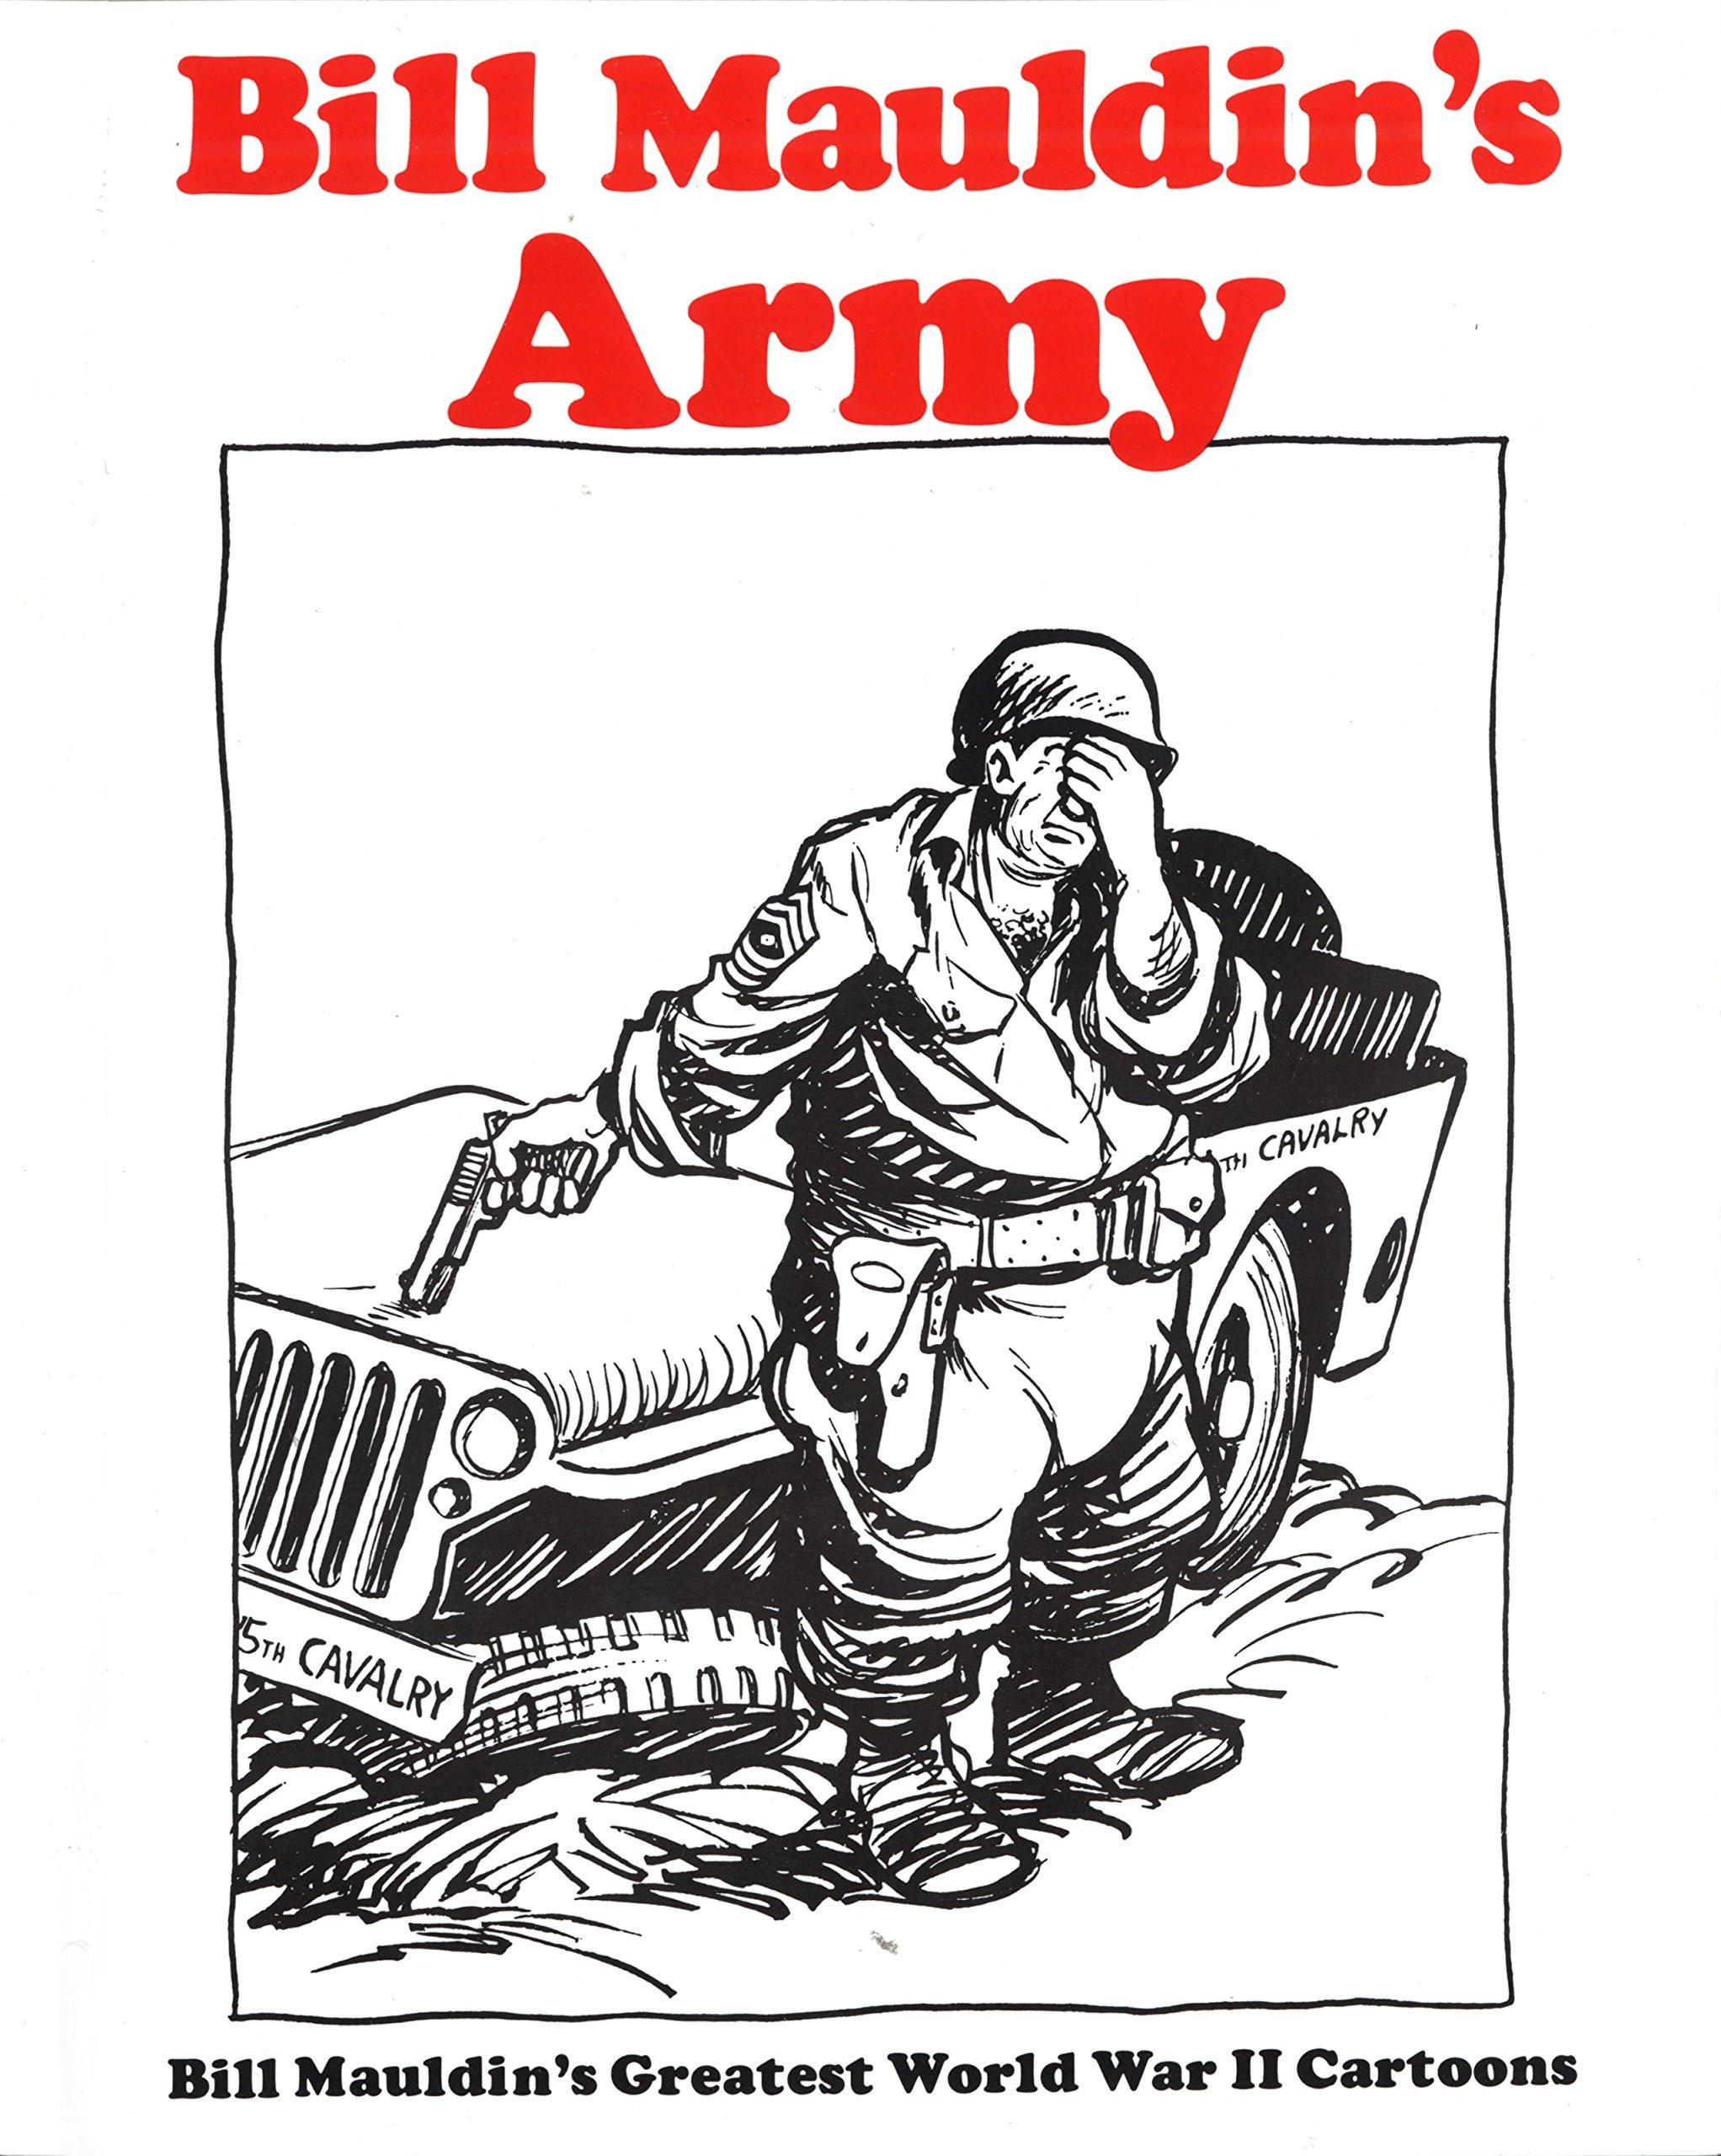 Bill Mauldin's Army: Bill Mauldin's Greatest World War II